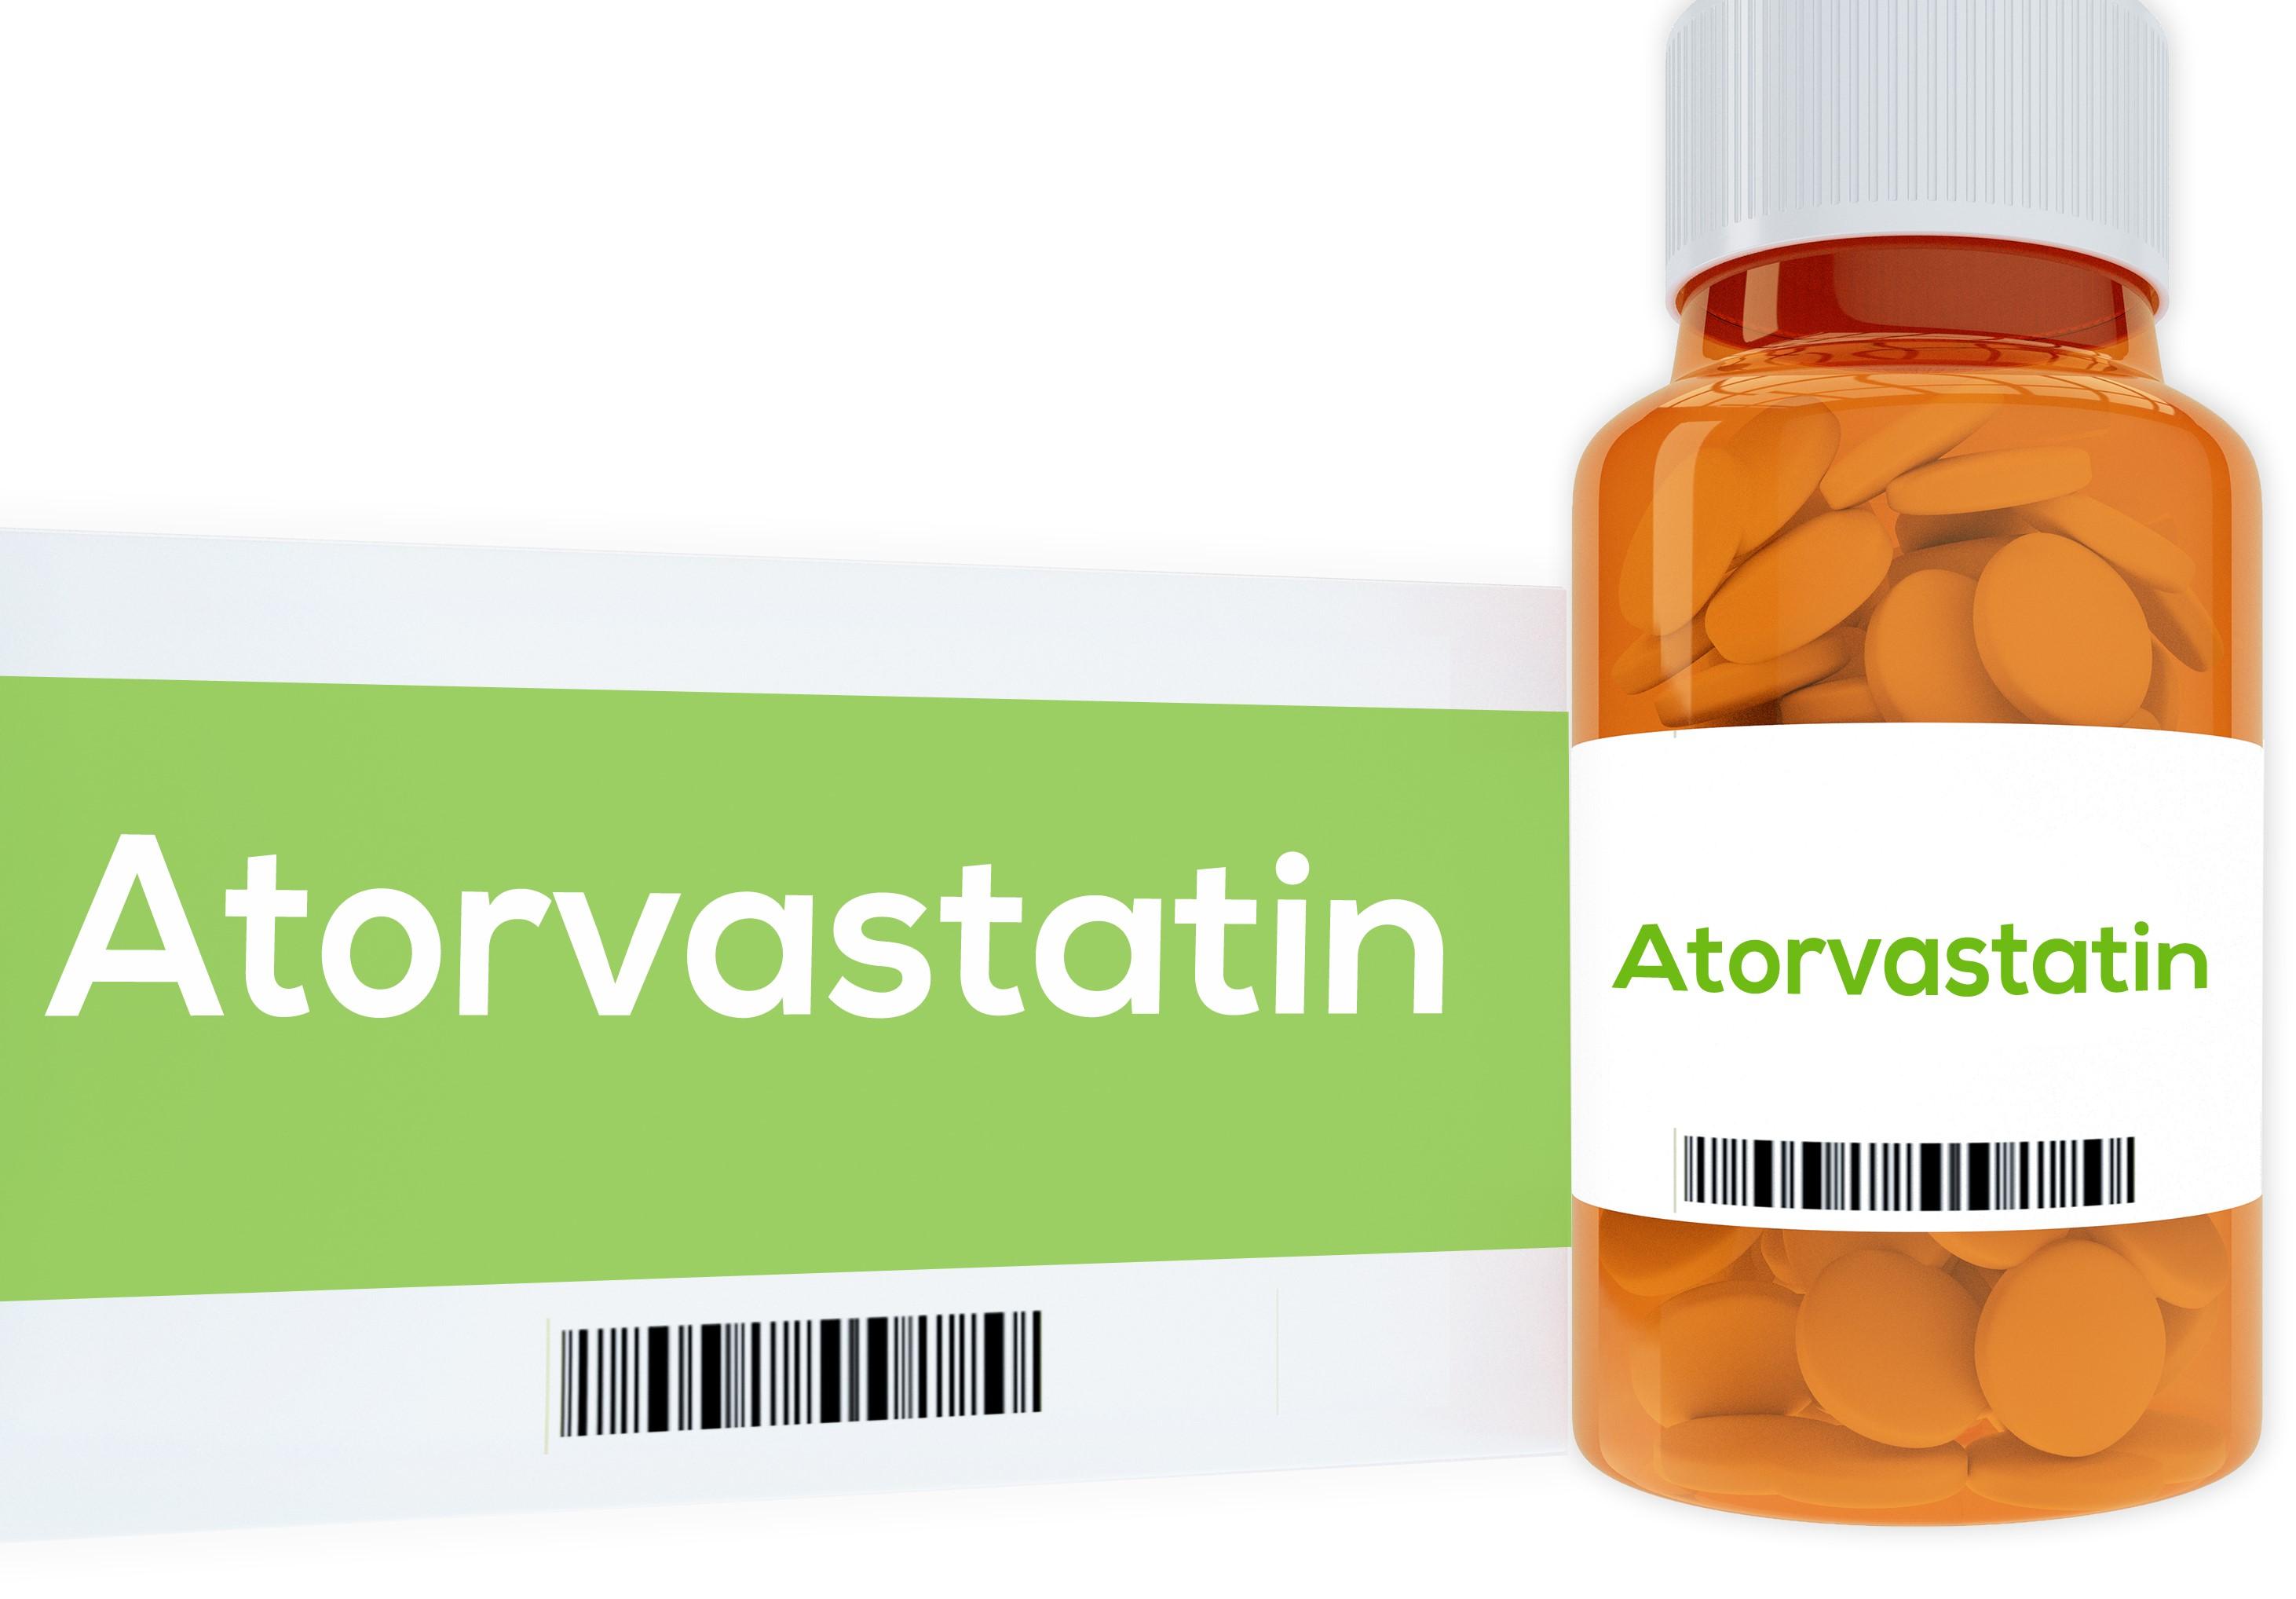 Product Recall Atorvastatin Our Blog Medwaste Management